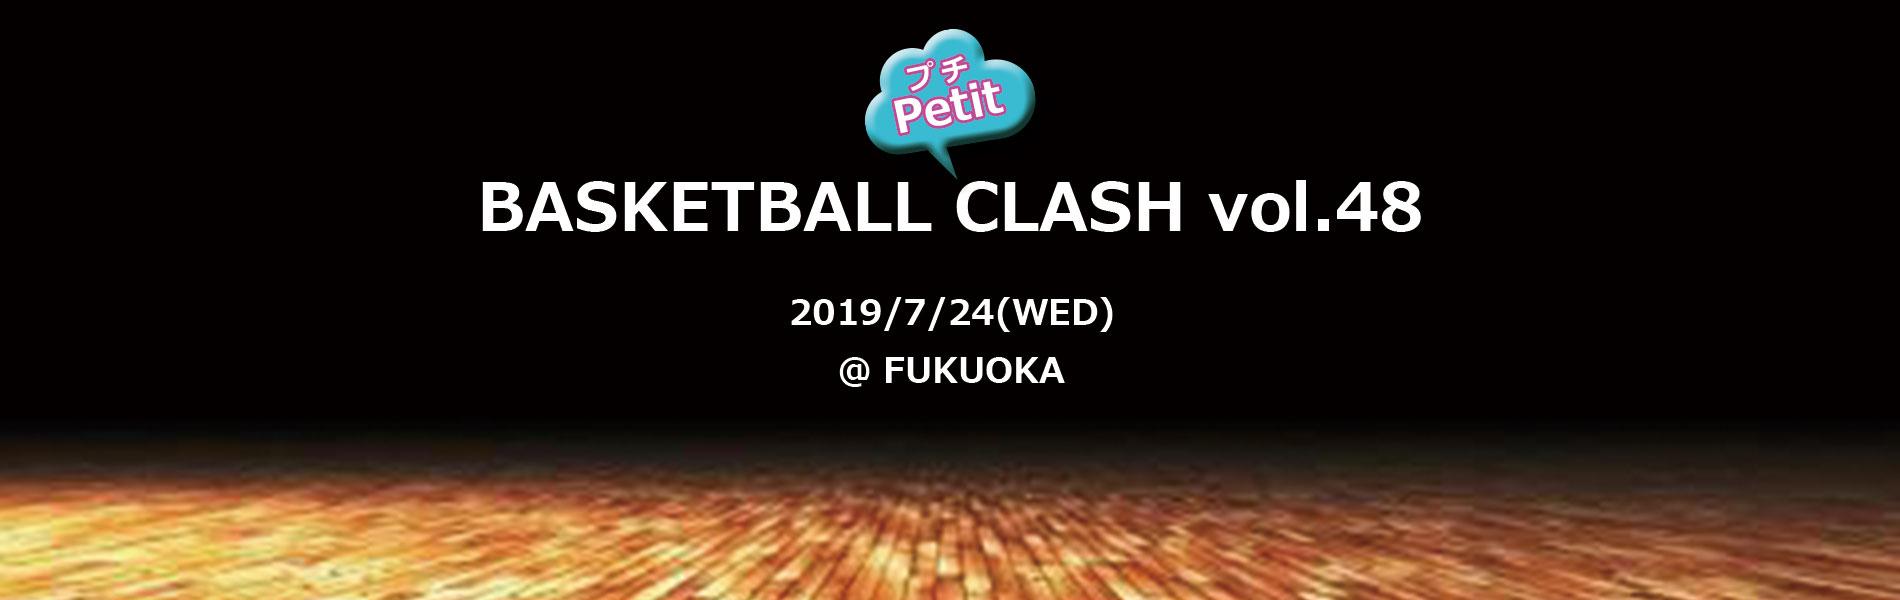 basketball clash 48